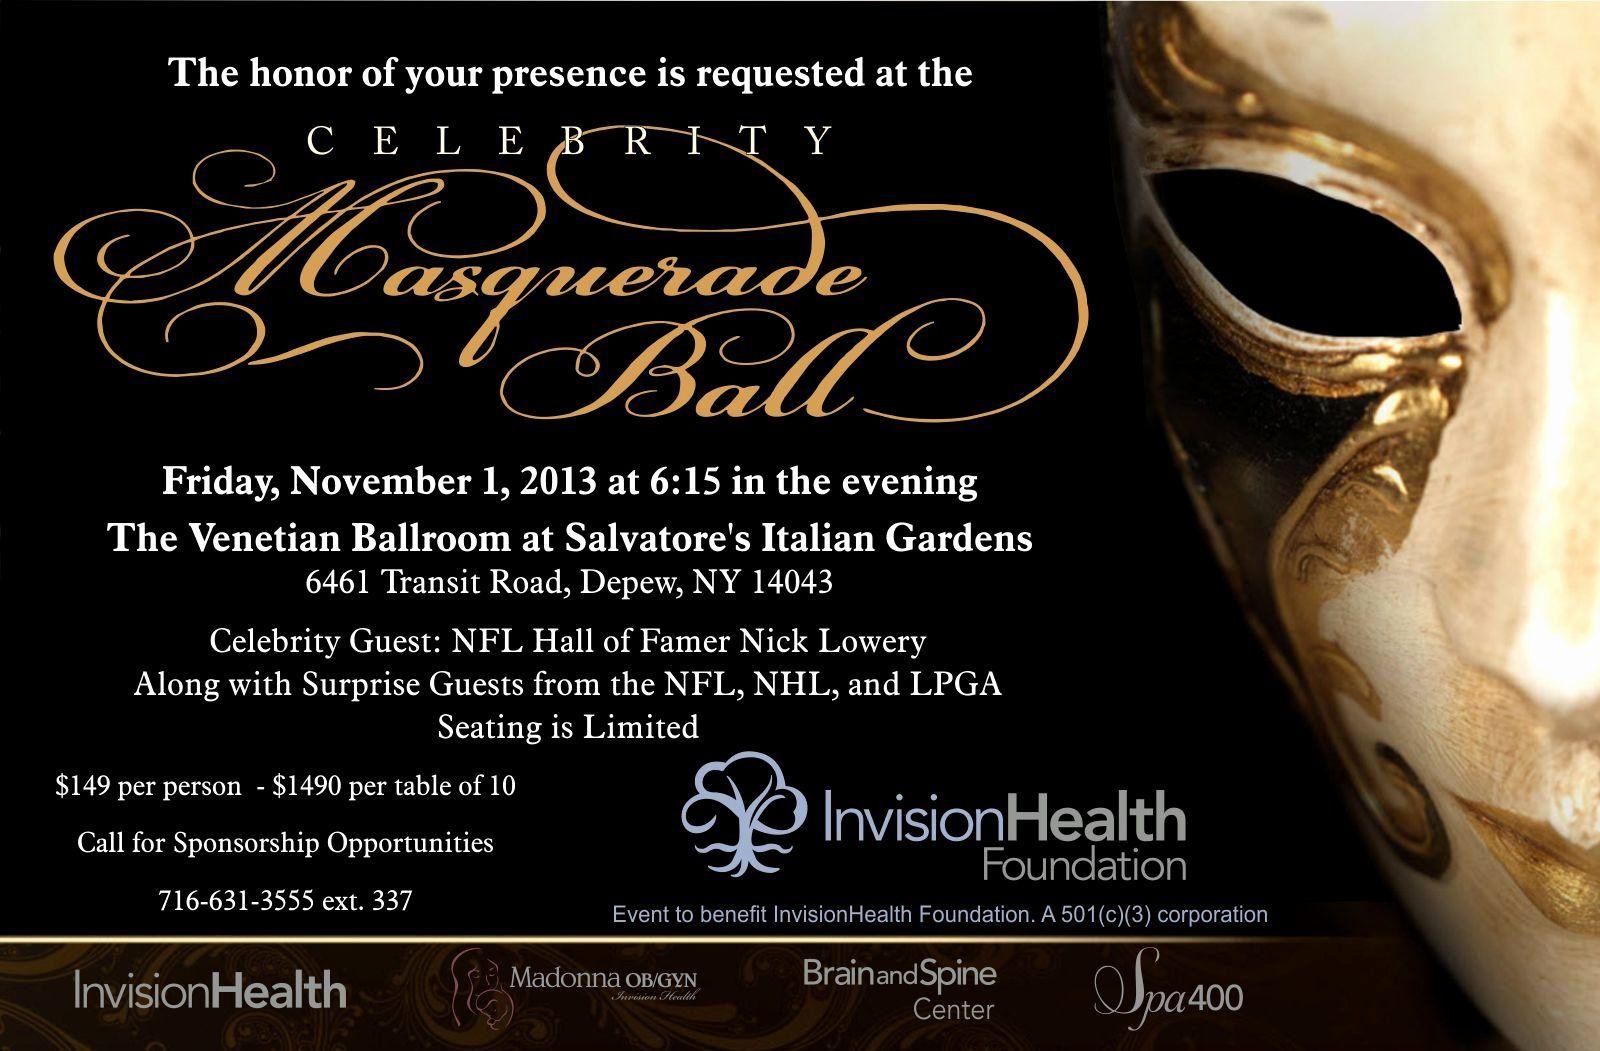 Masquerade Ball Invitation Template Awesome Ball Invitation Quotes Quotesgram Masquerade Invitations Masquerade Party Invitations Party Invite Template